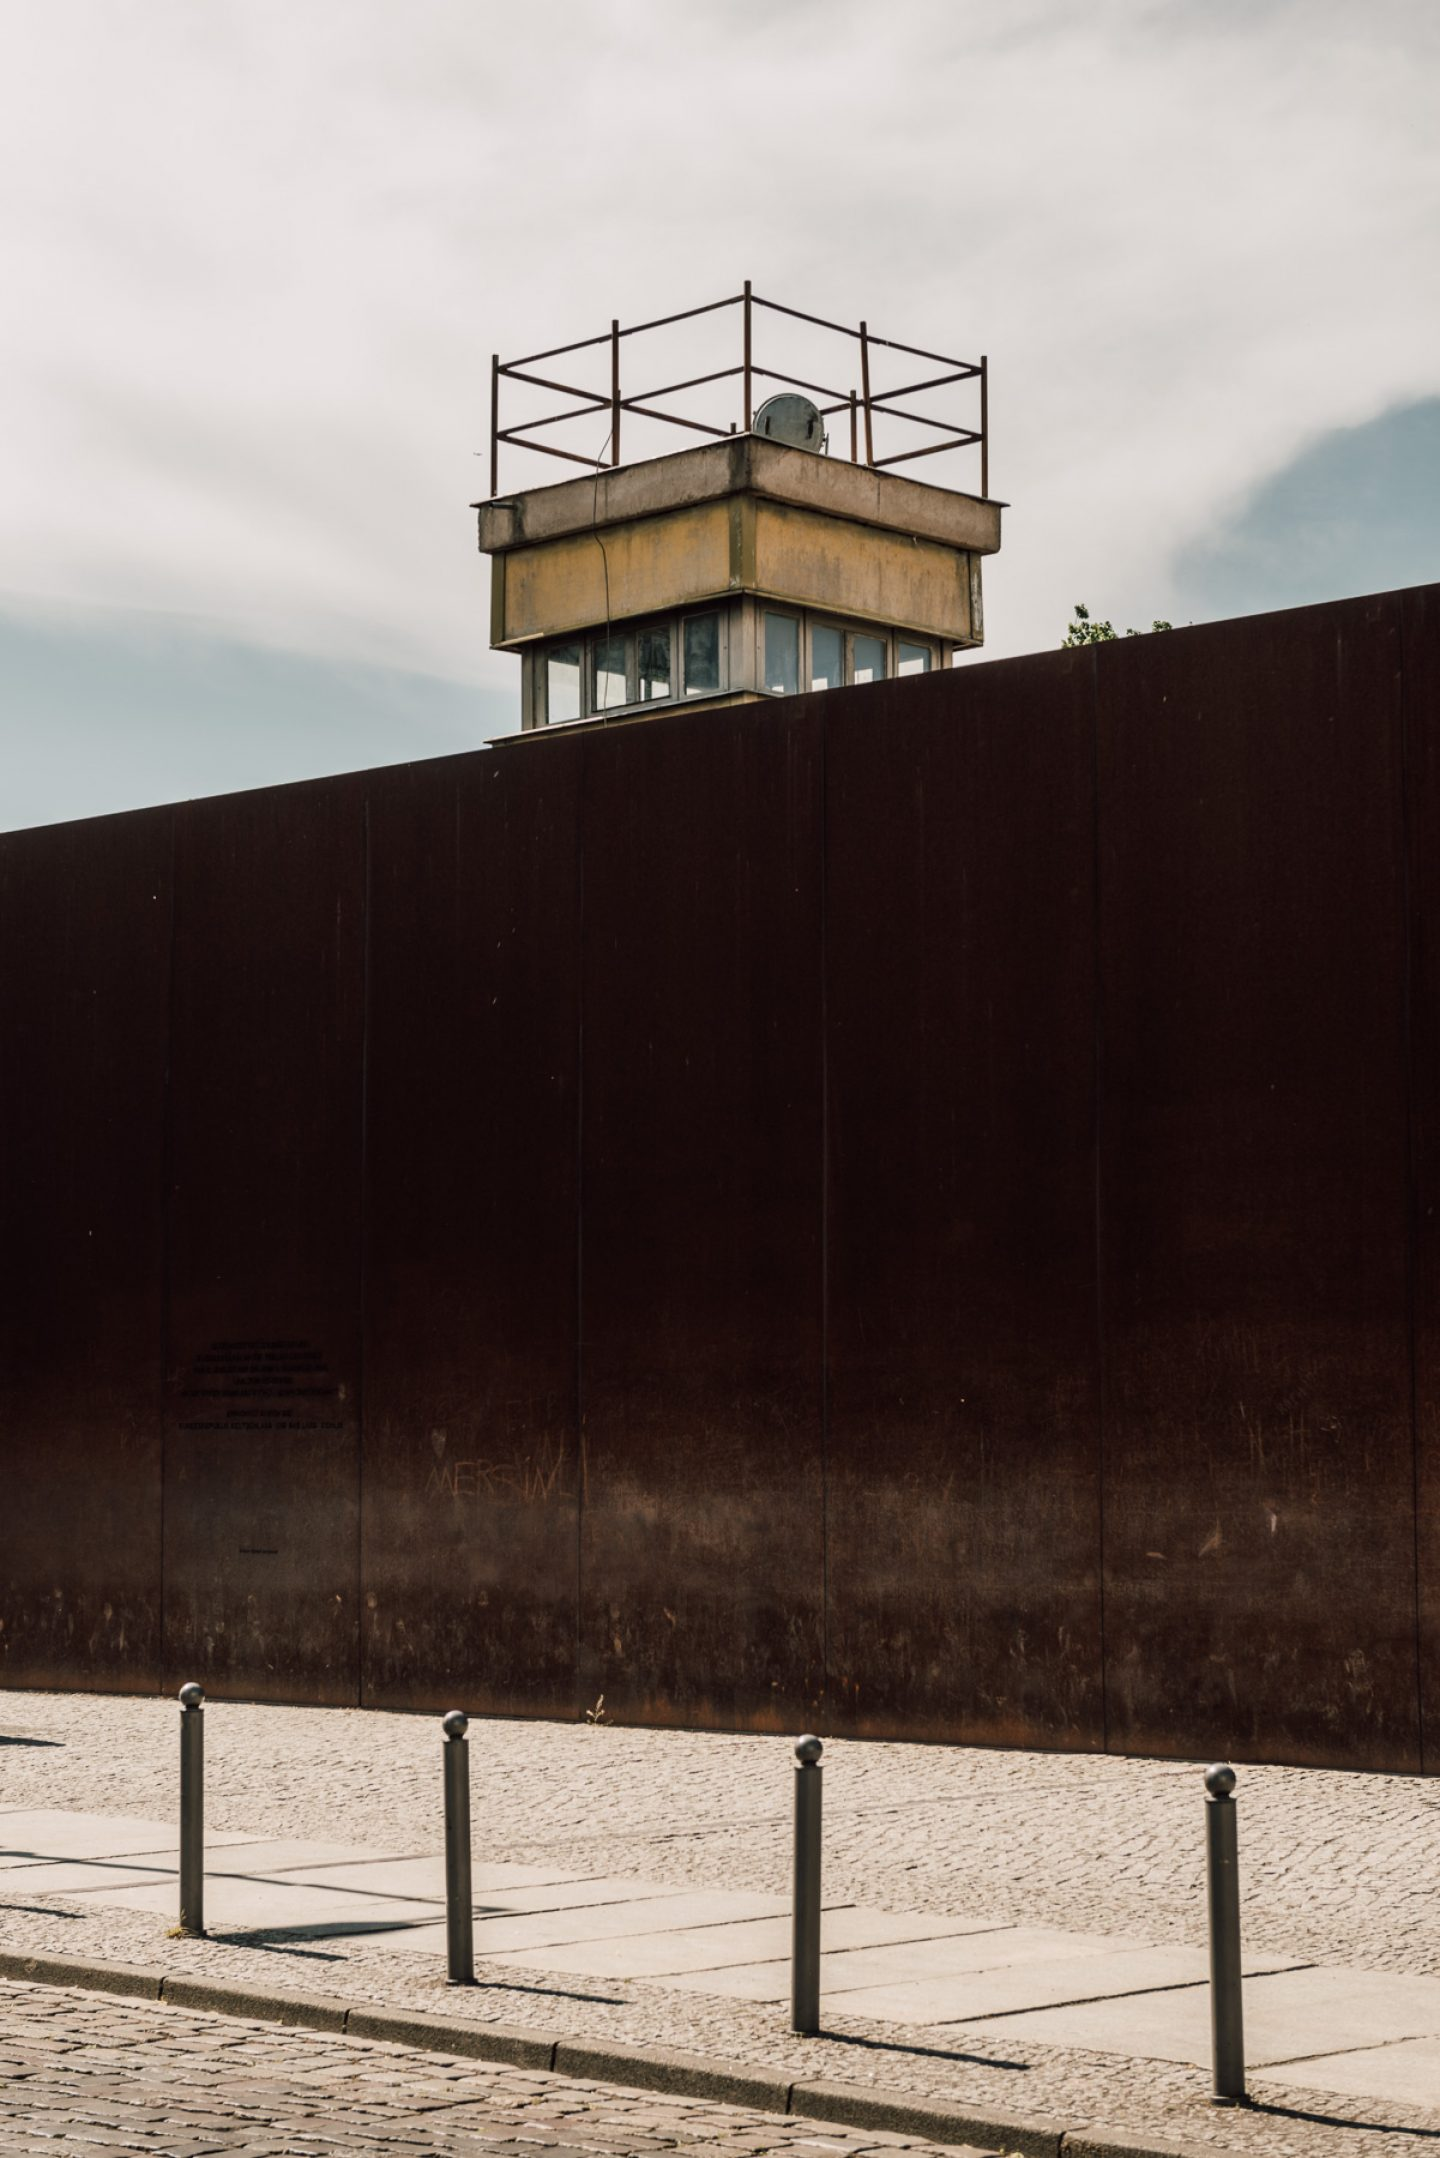 ignant-berlin-wall-biennale-5258